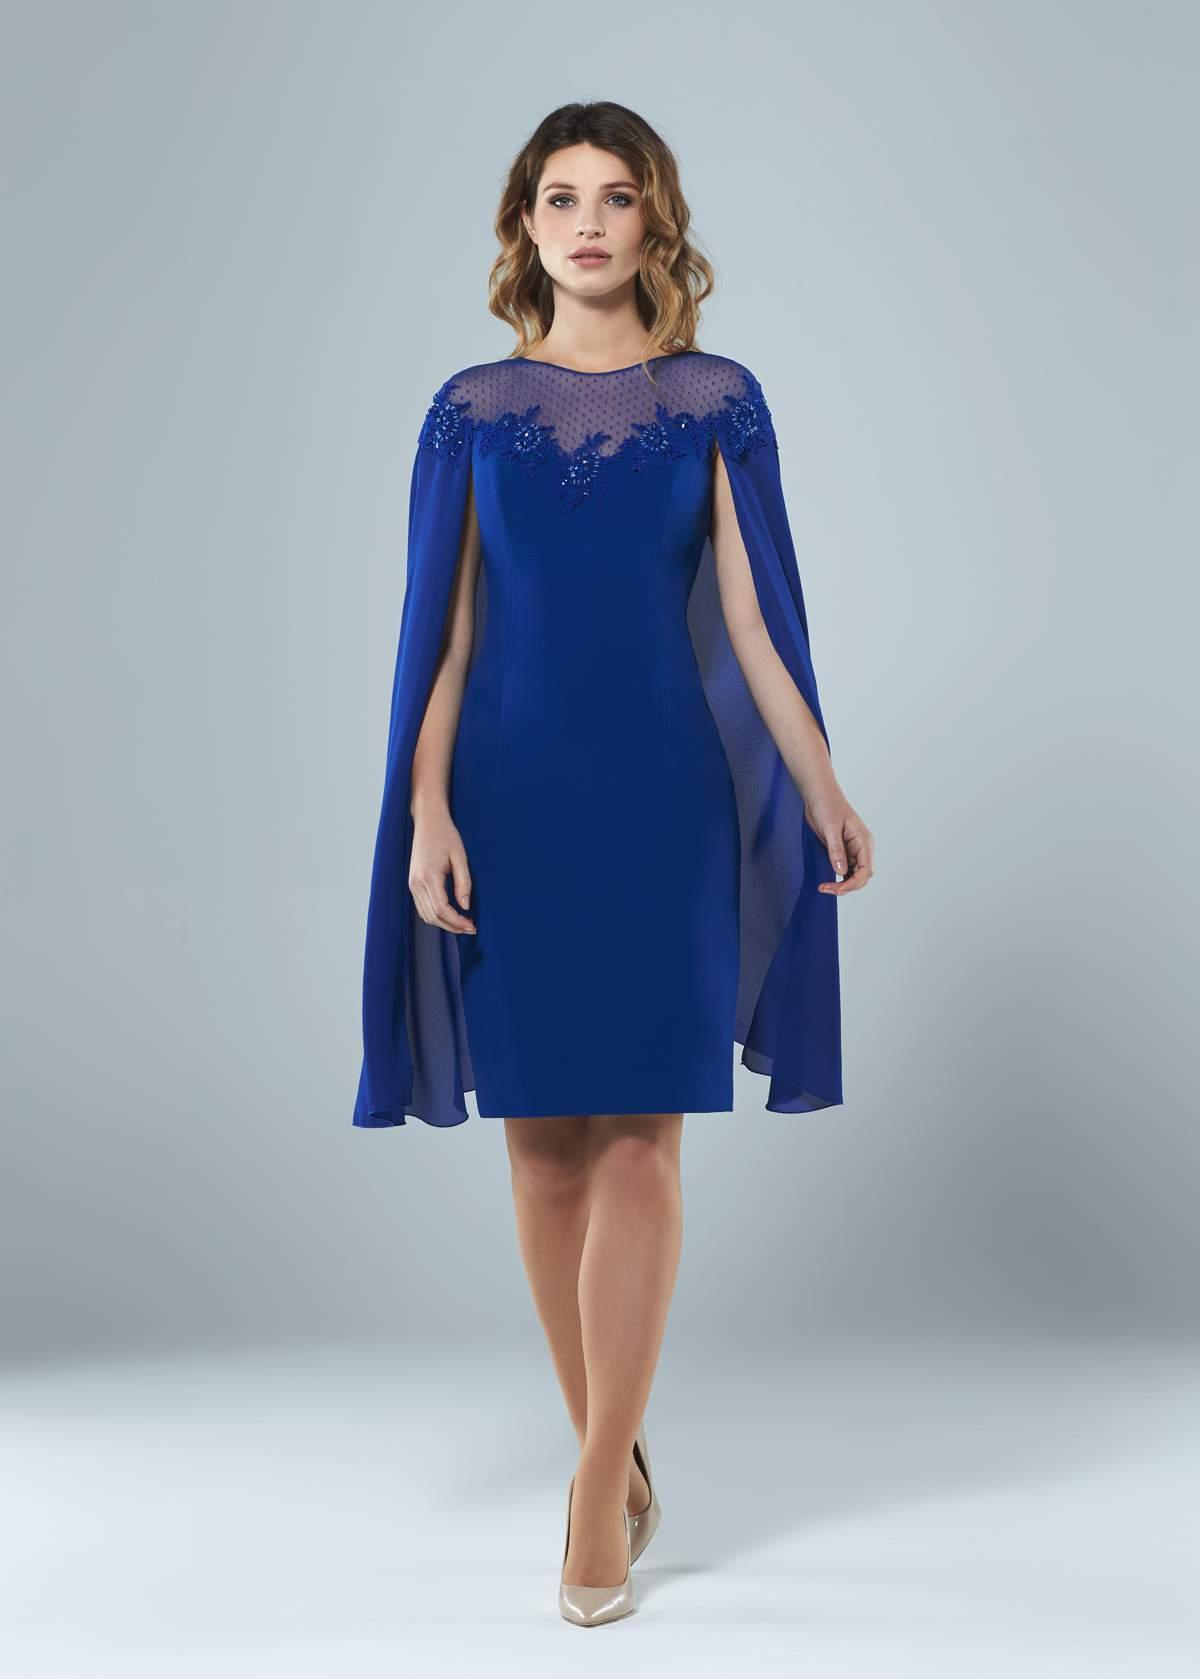 Spot Tulle Cape Dress